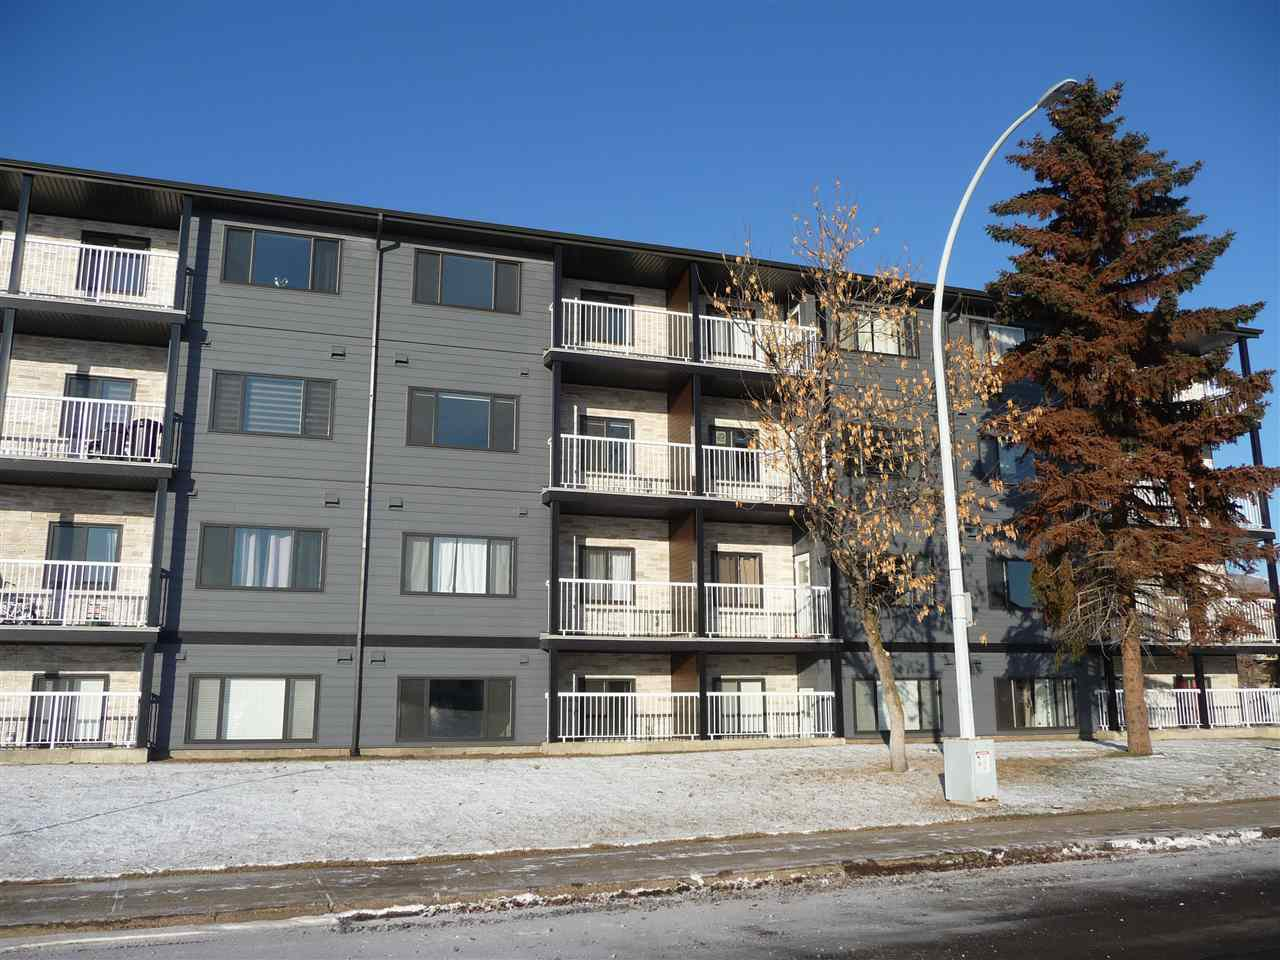 Main Photo: 405 14808 26 Street NW in Edmonton: Zone 35 Condo for sale : MLS®# E4185958